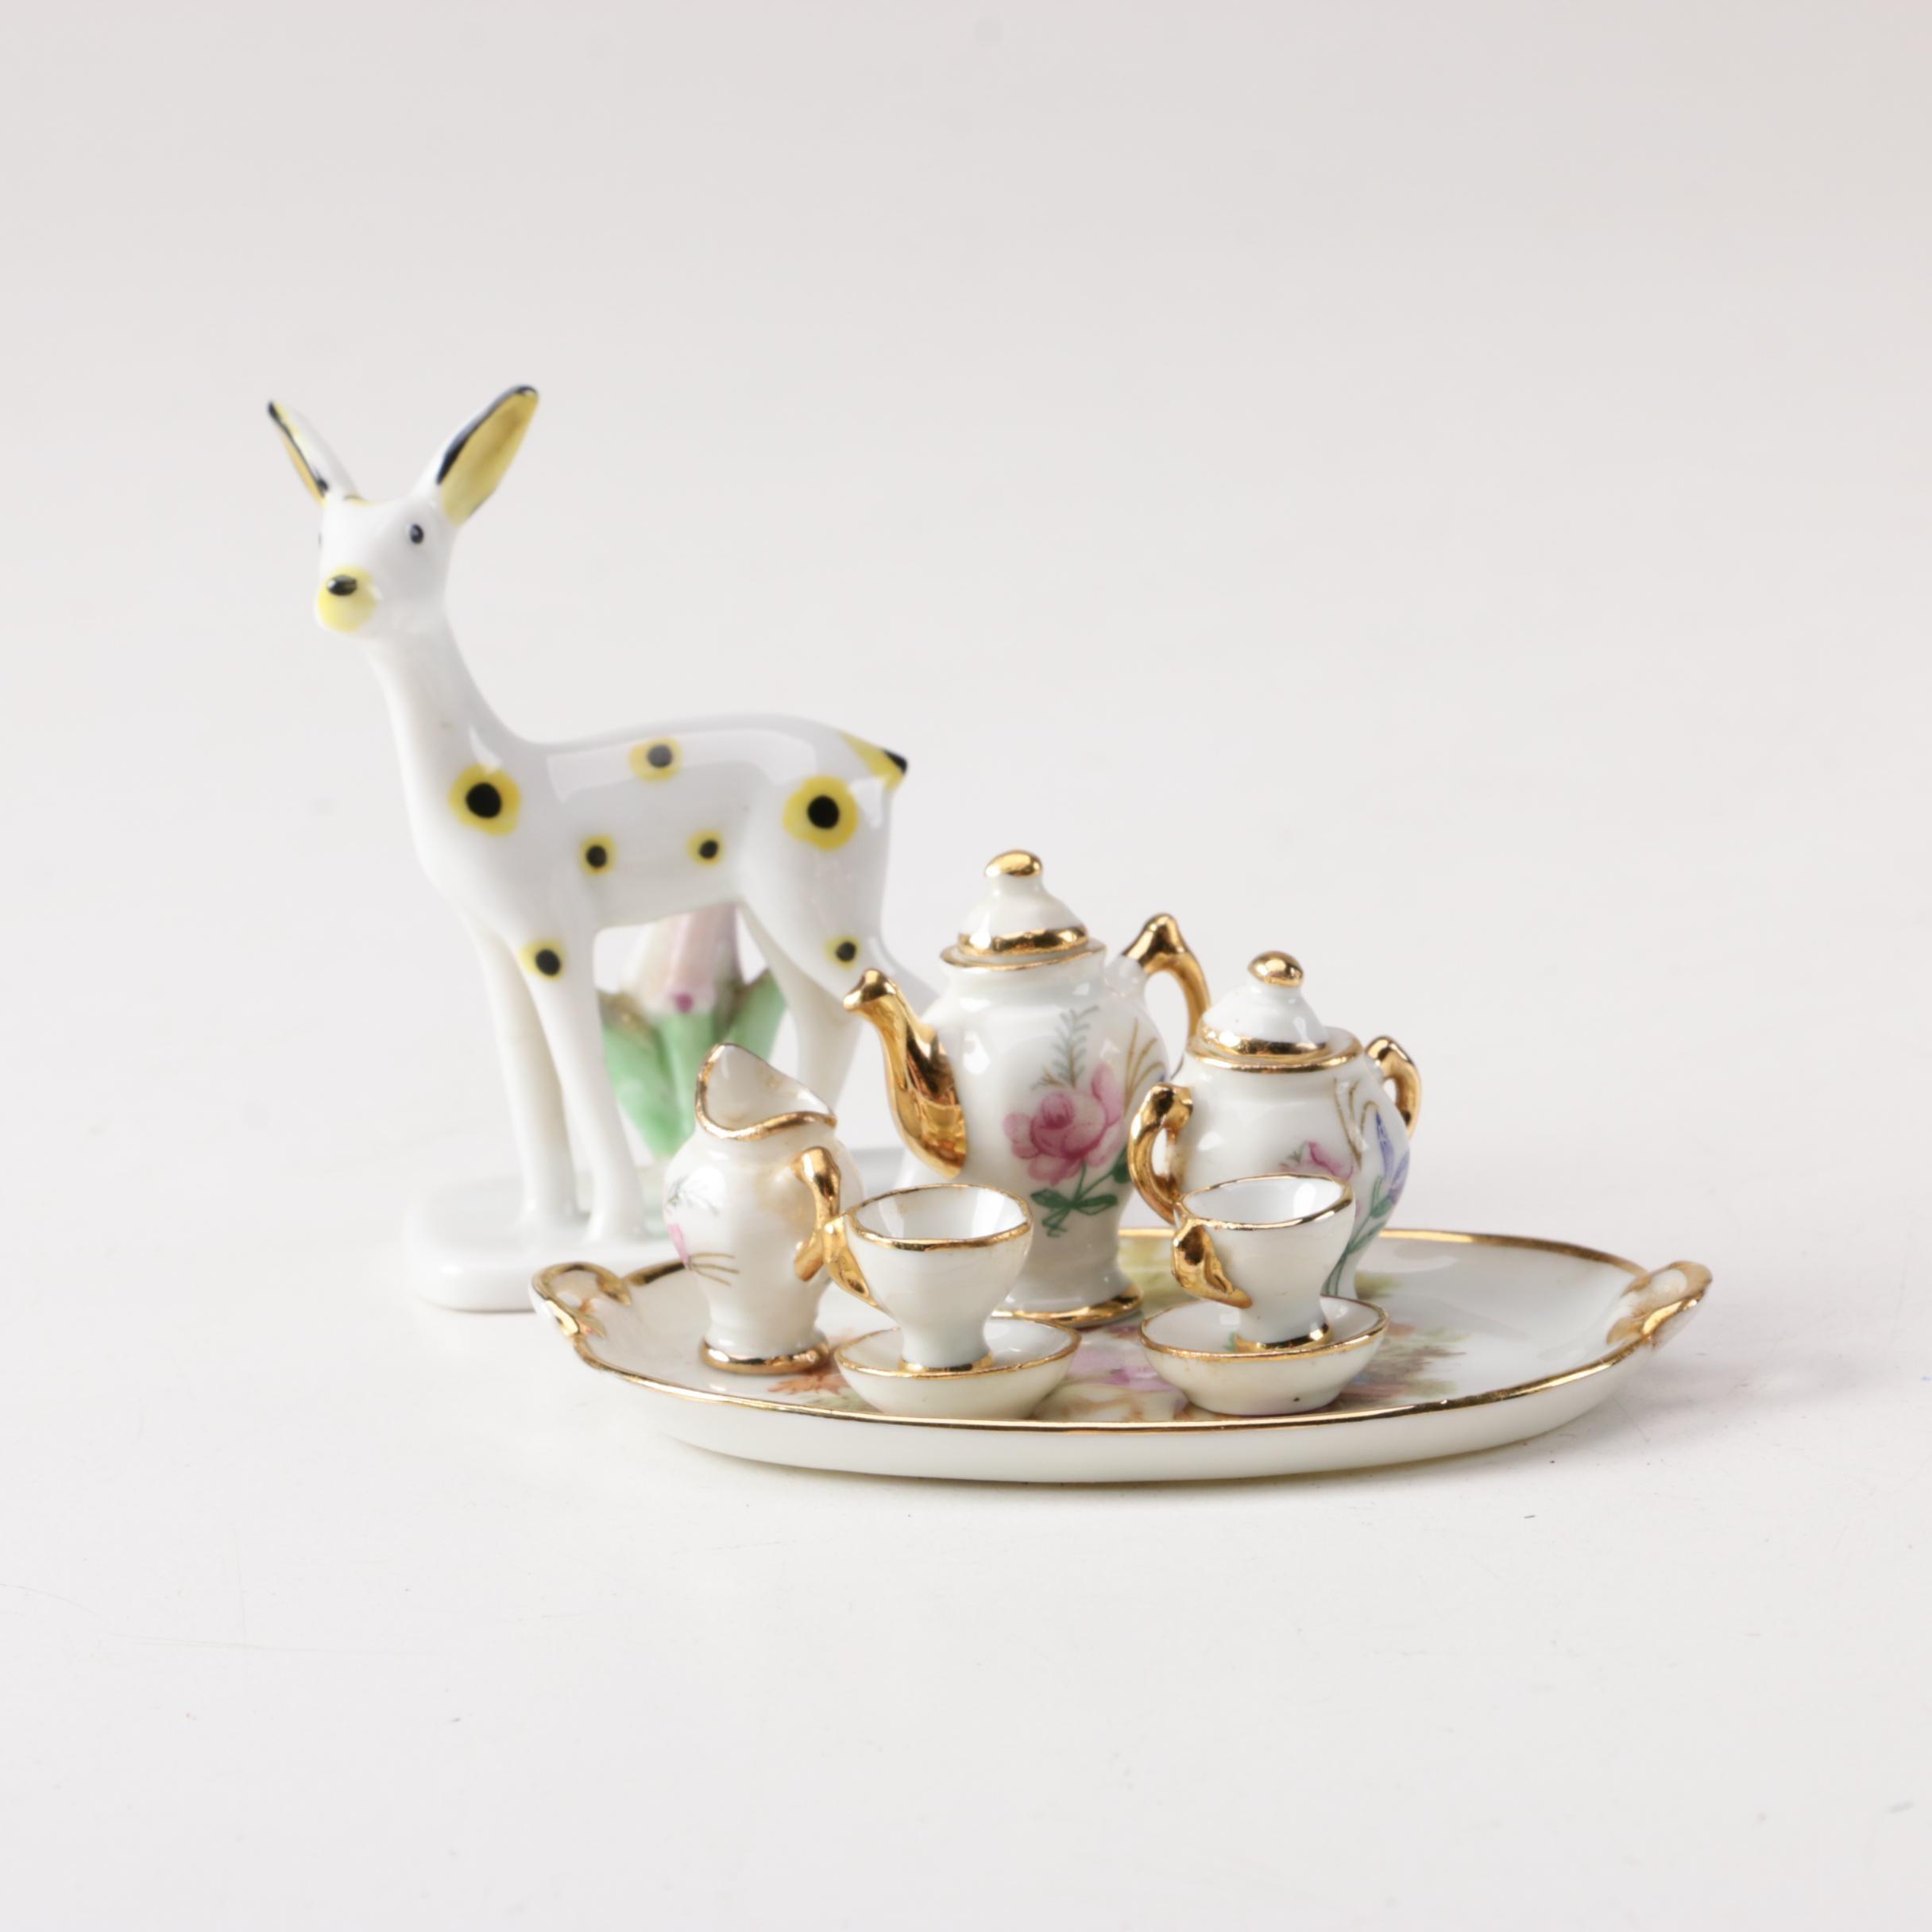 Miniature Porcelain Tea Set and Deer Figurine